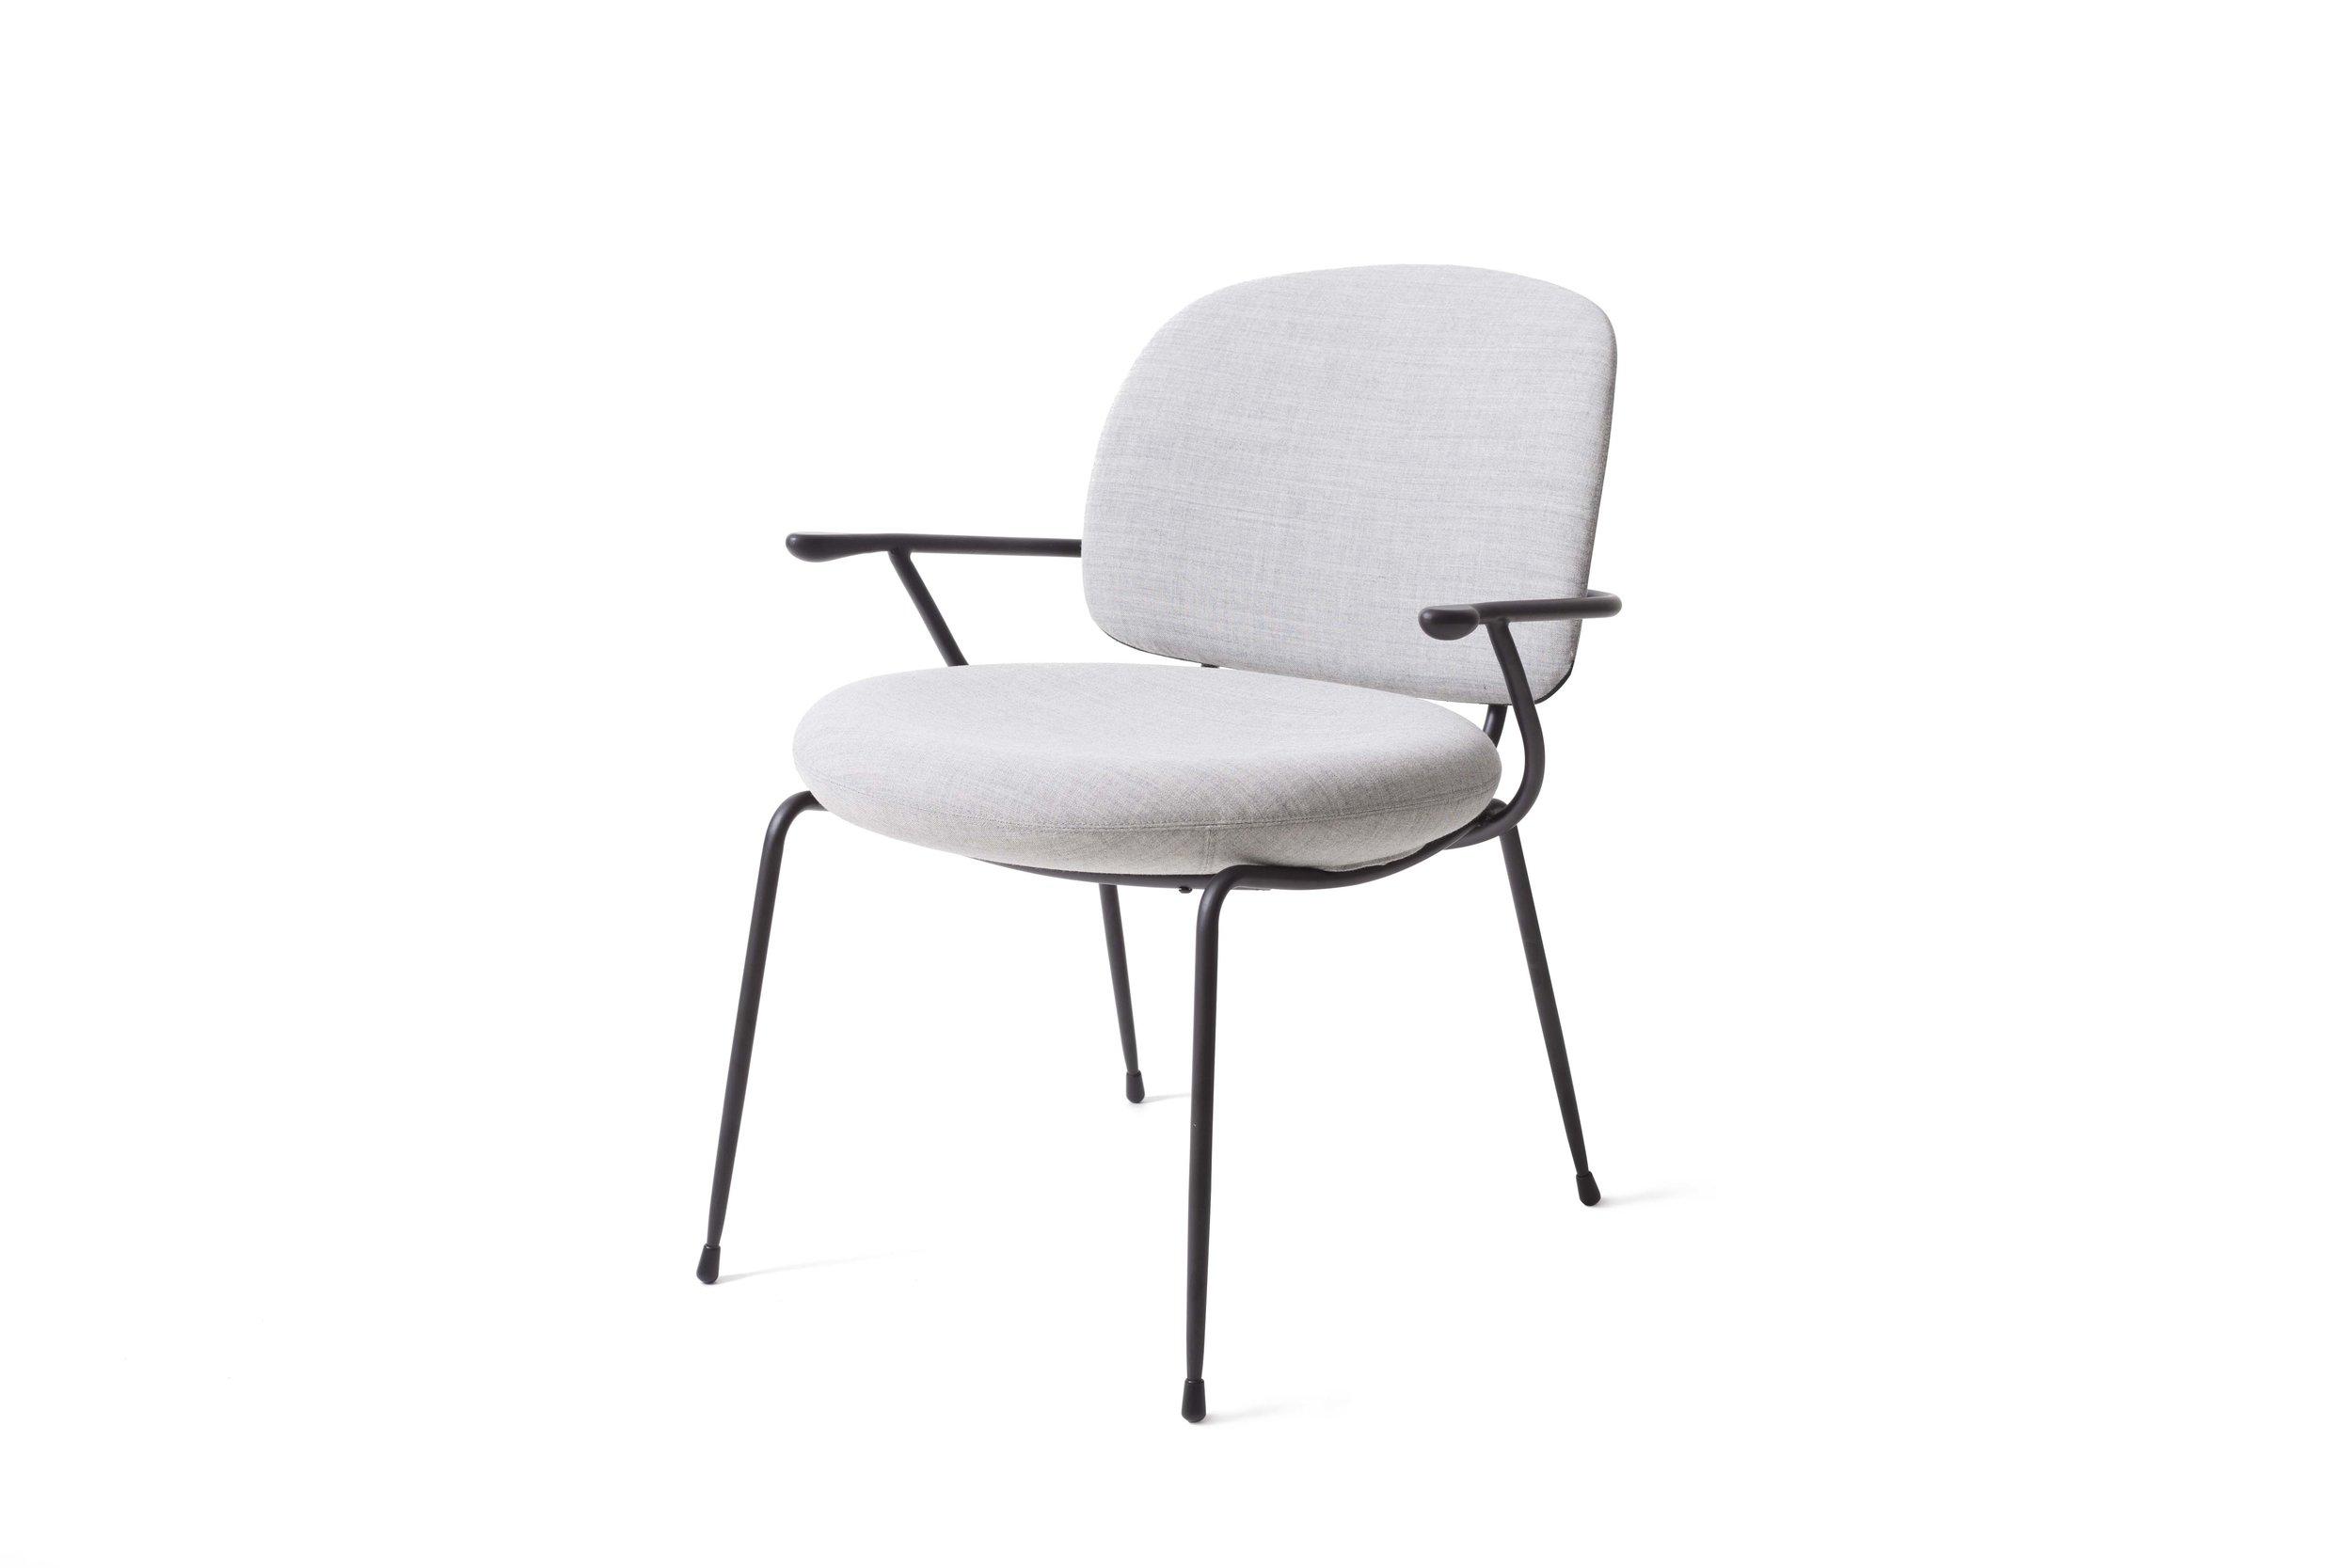 Stellar Works - Industry Lounge Chair